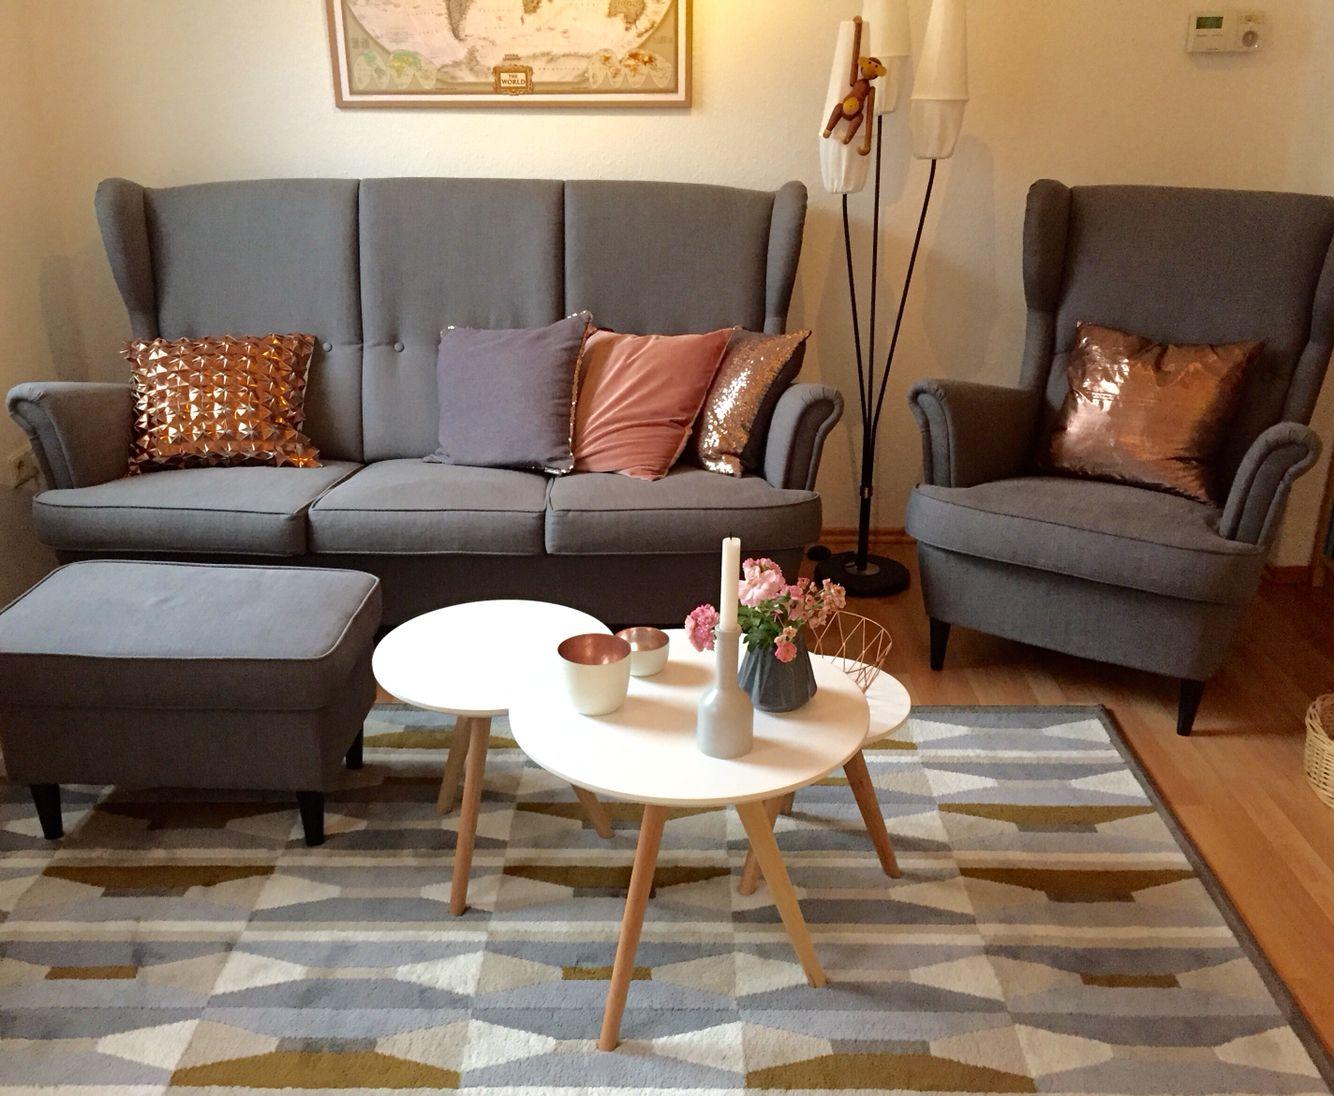 Mid century modern living room with IKEA Strandmon Sofa